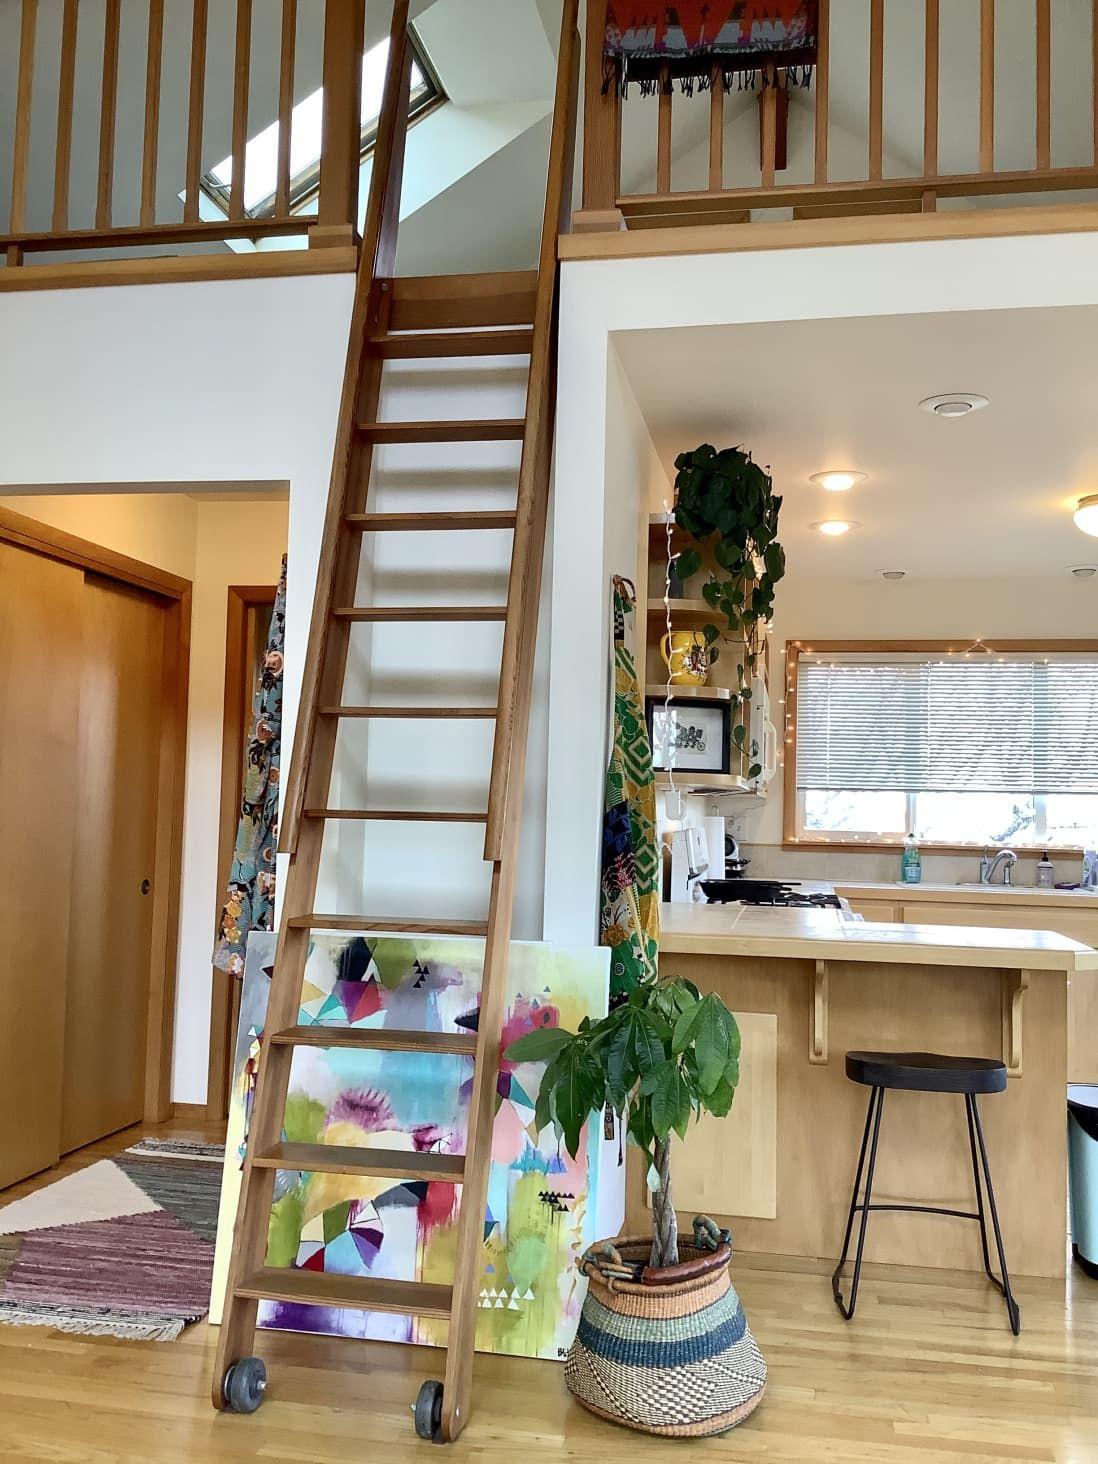 Dupree Studios,Artist loft spaces vacation rental in